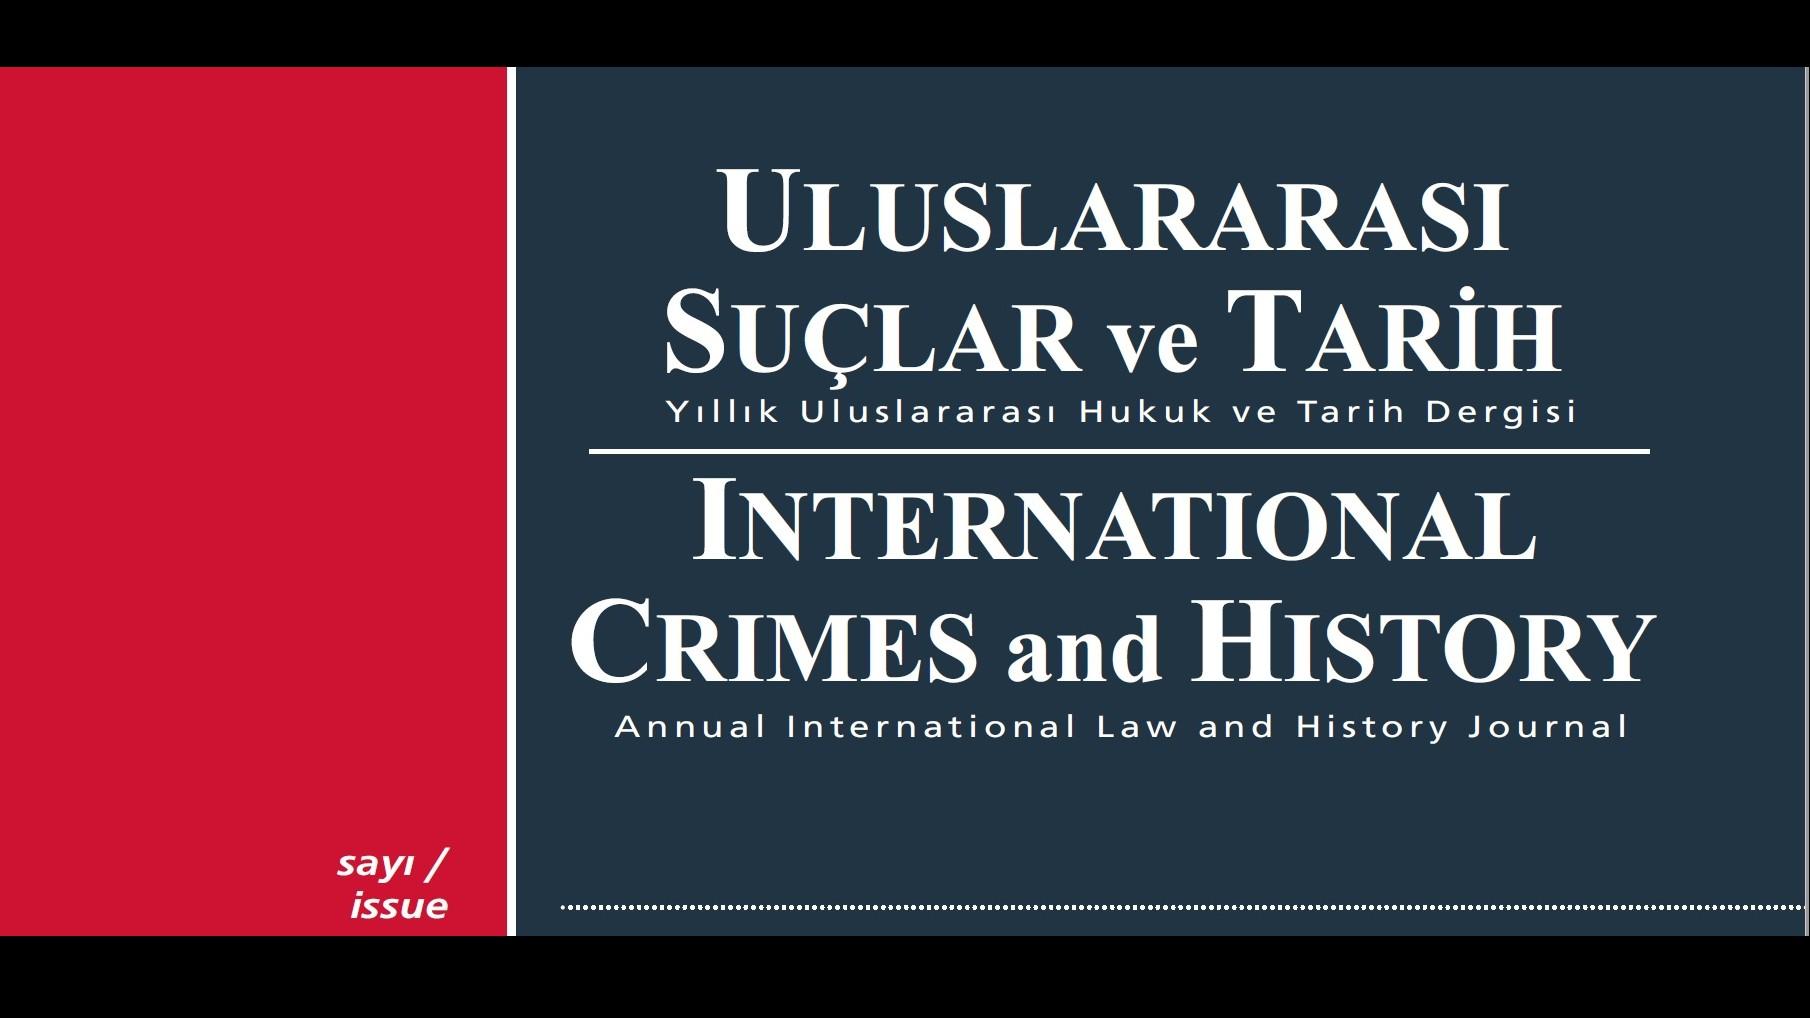 MAKALE ÇAĞRISI: ULUSLARARASI SUÇLAR VE TARİH / INTERNATIONAL CRIMES AND HISTORY JOURNAL